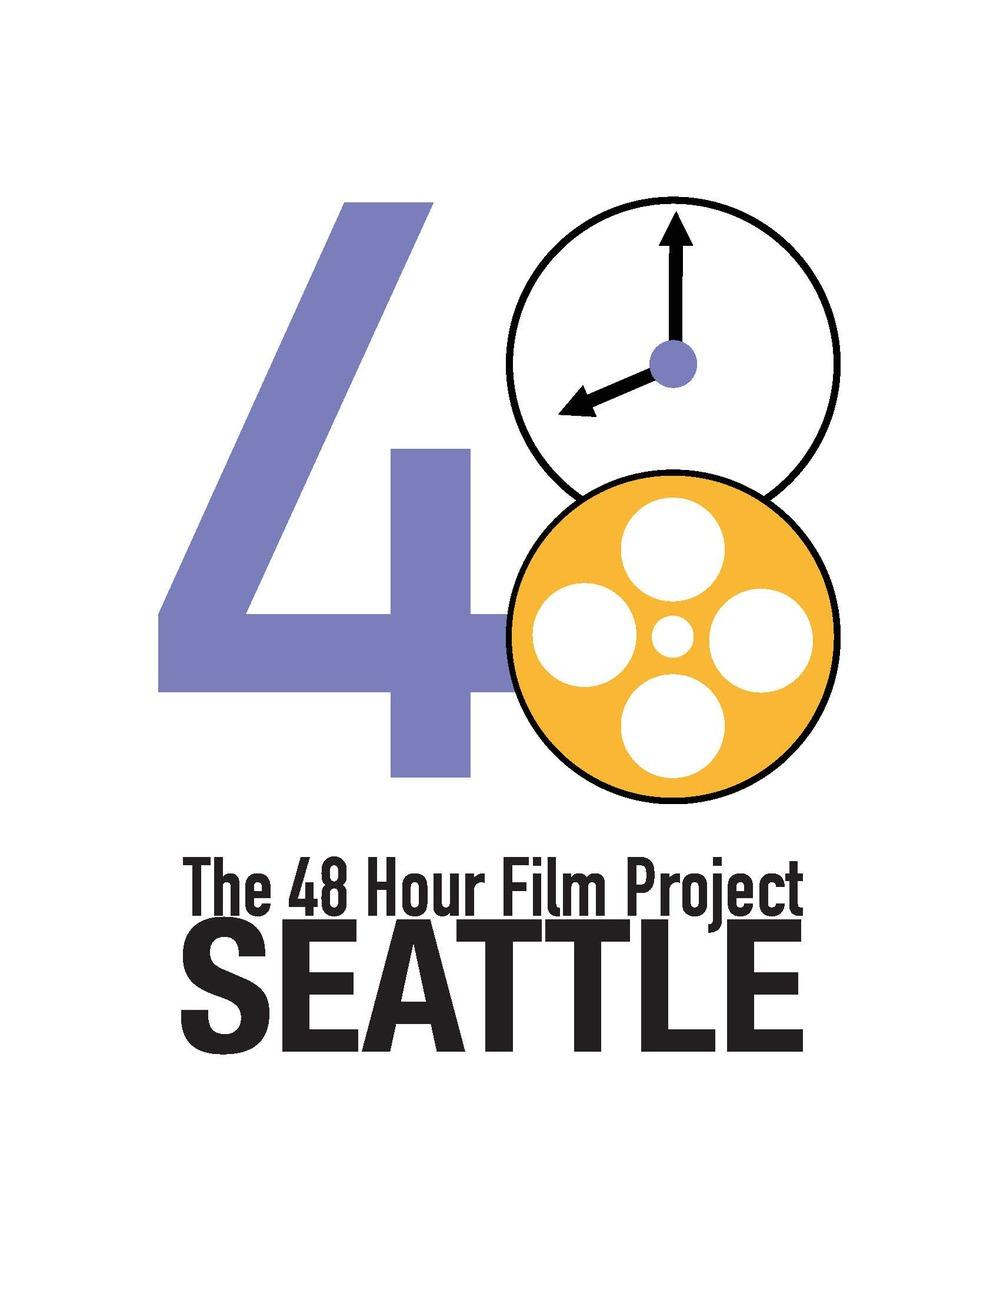 Sea48HFP-logo.jpg